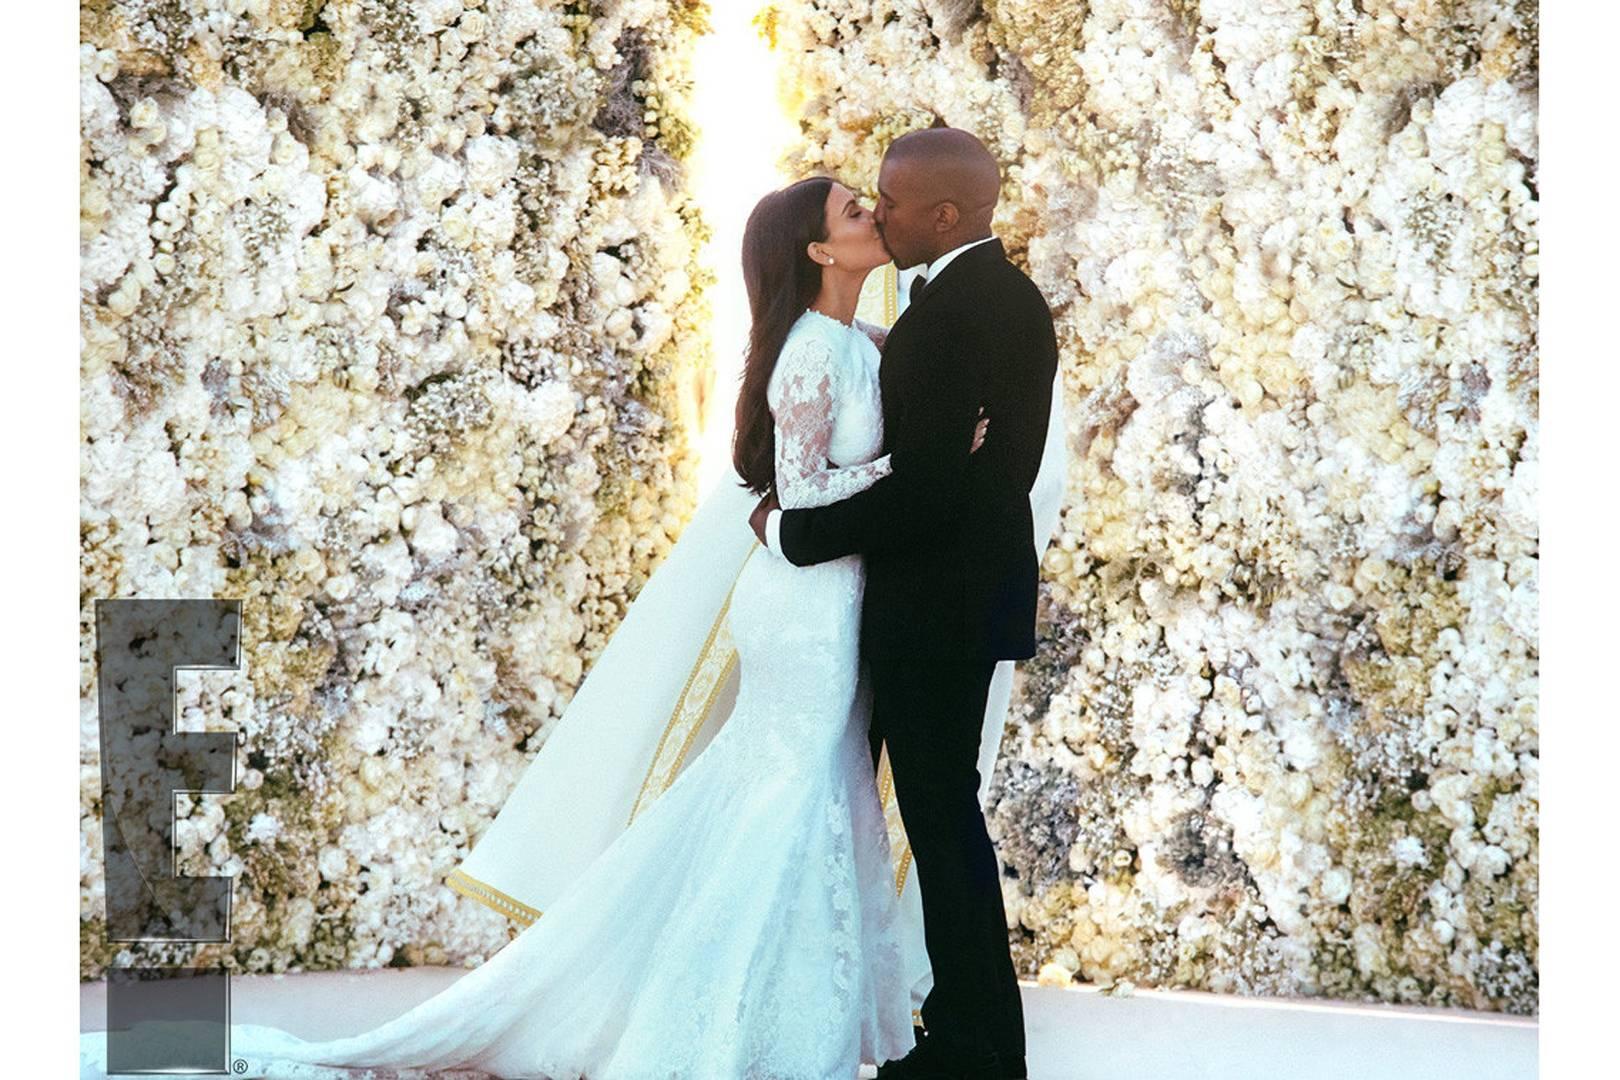 Kim kardashian wedding to kanye west engagement anniversary kim kardashian wedding to kanye west engagement anniversary pictures glamour uk ombrellifo Image collections